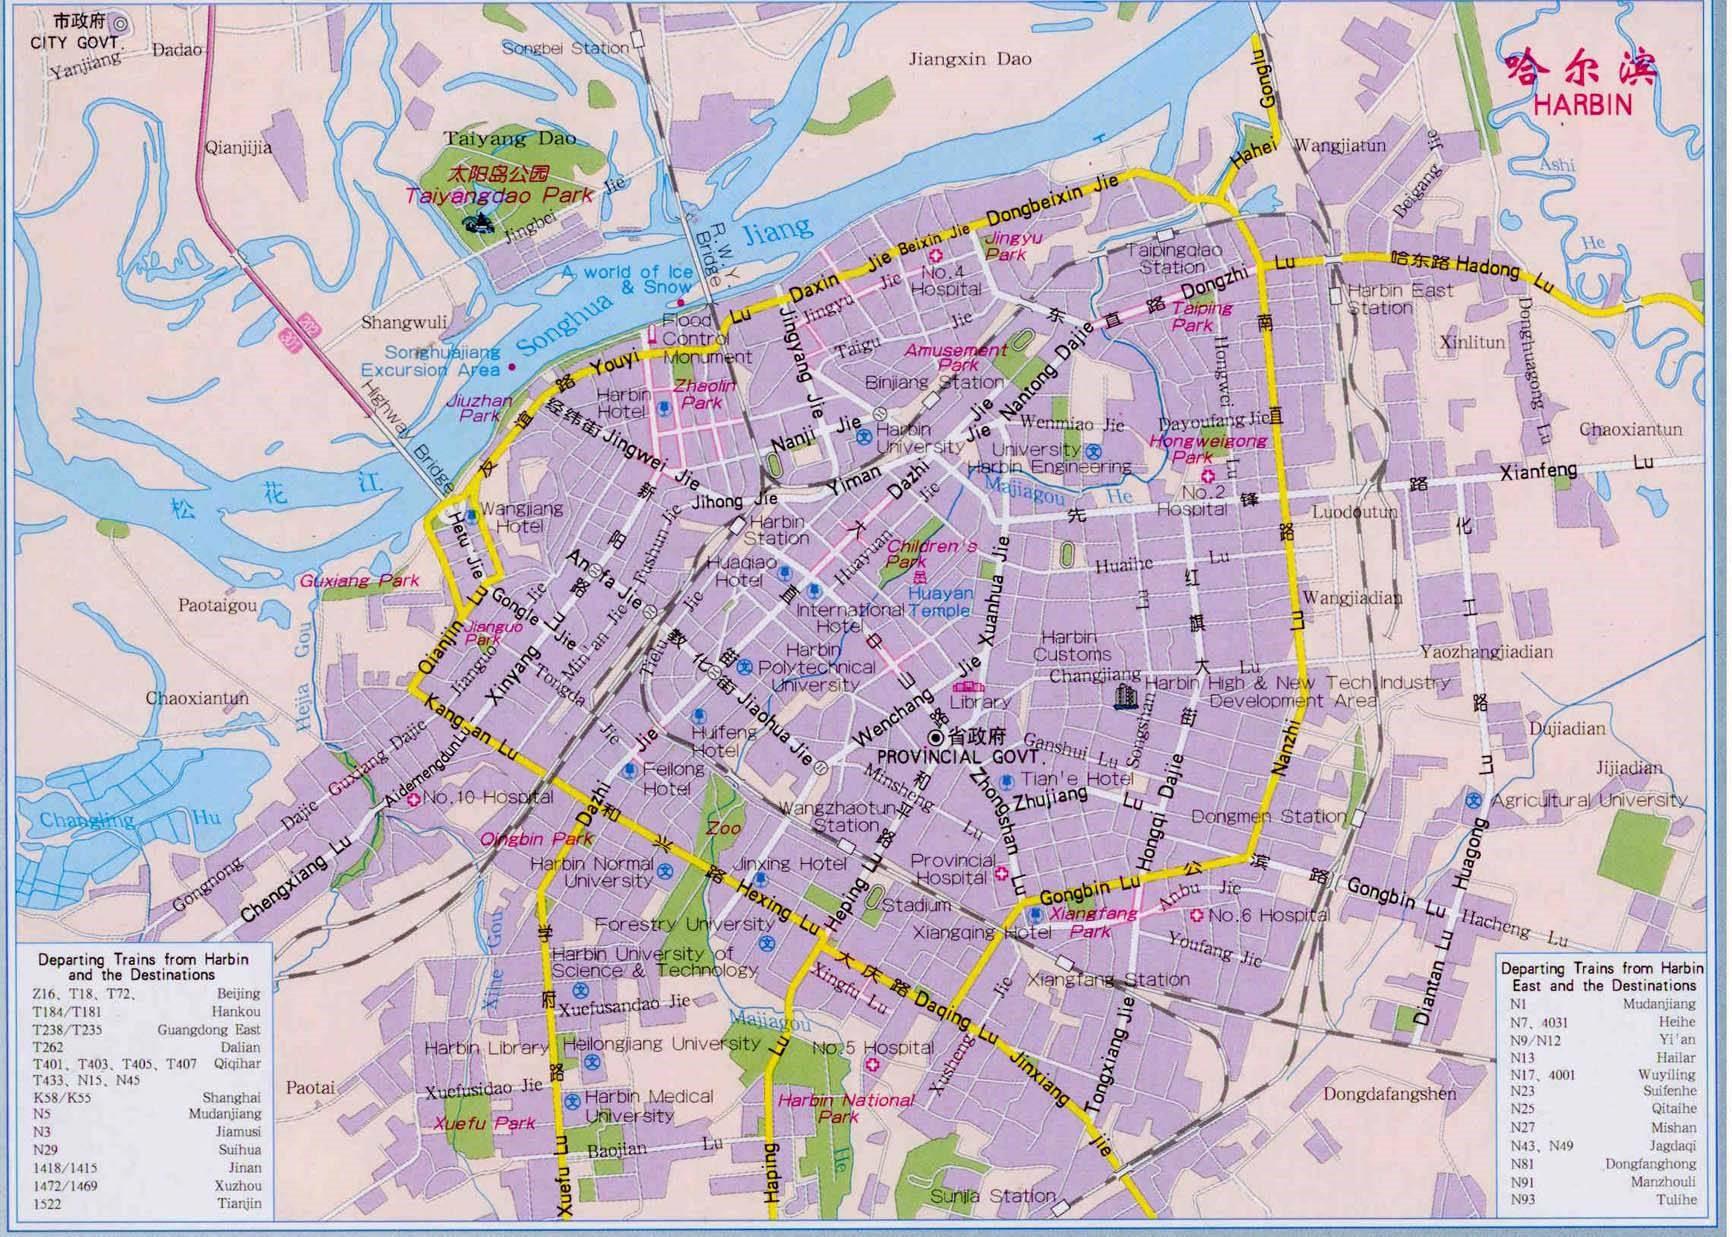 Достопримечательности Харбина на карте